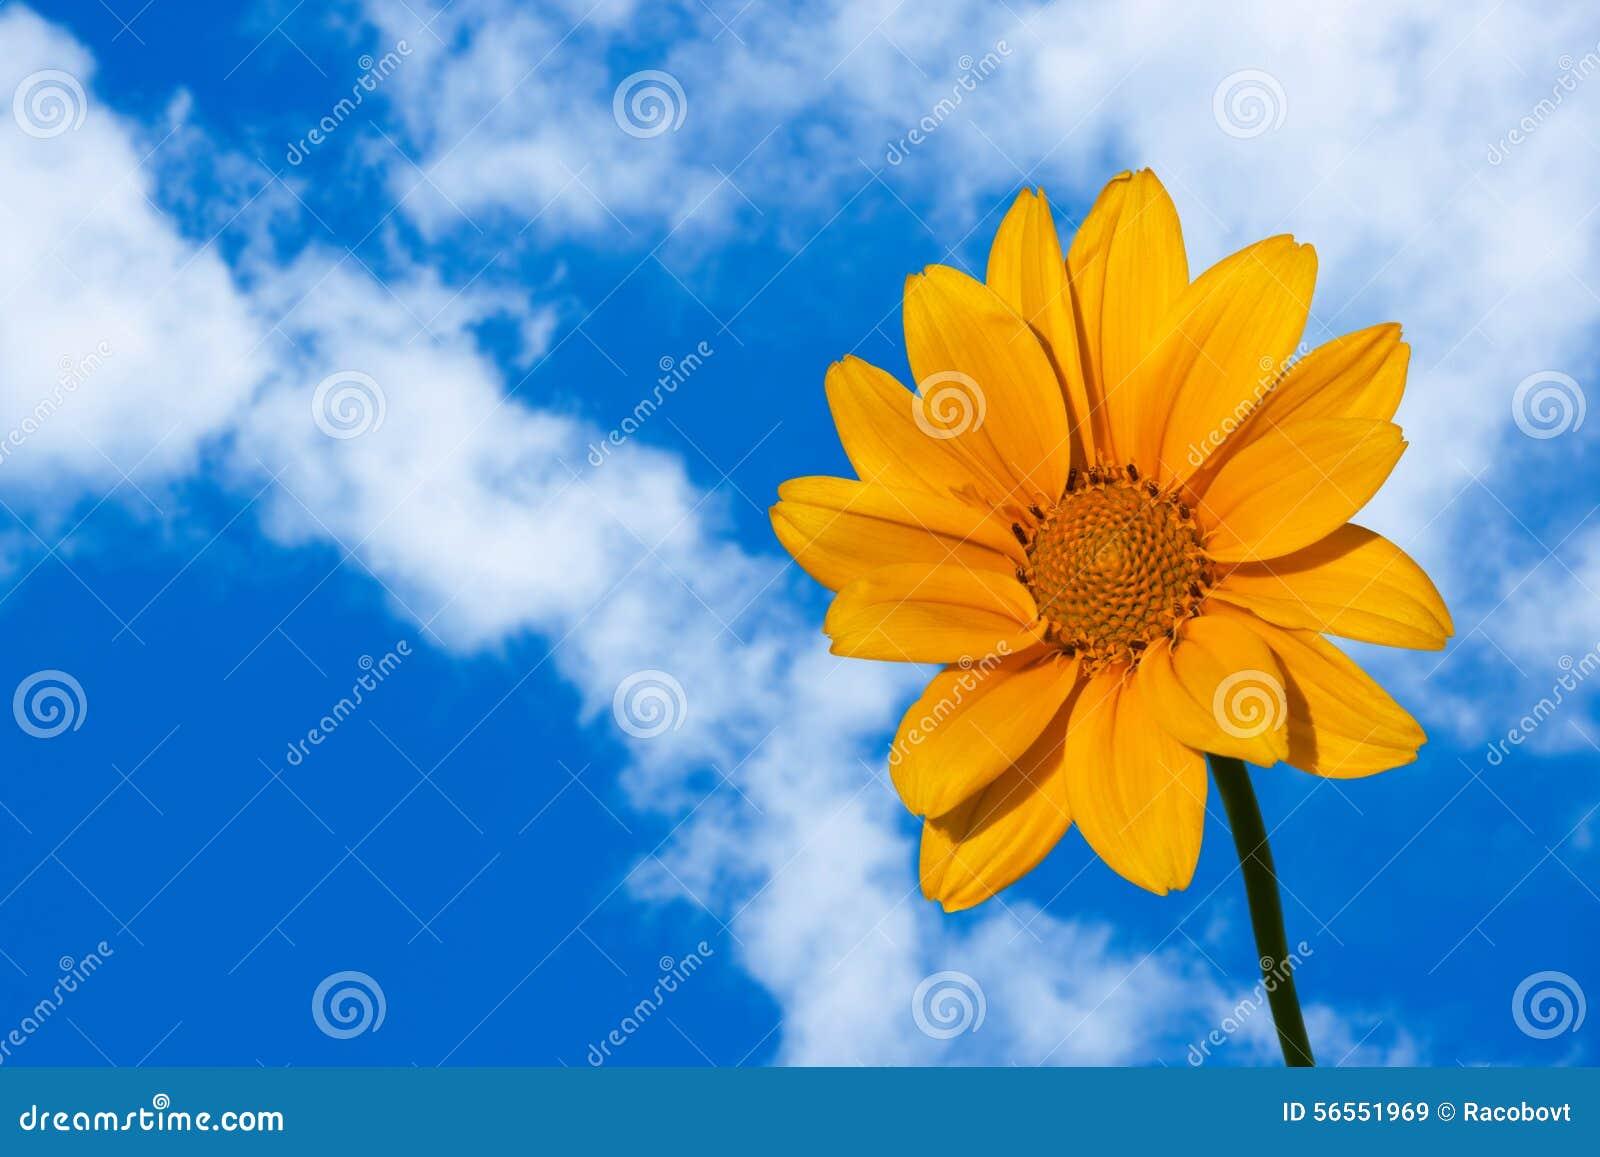 Download Κίτρινη ντάλια στοκ εικόνα. εικόνα από ημέρα, αιώνιος - 56551969